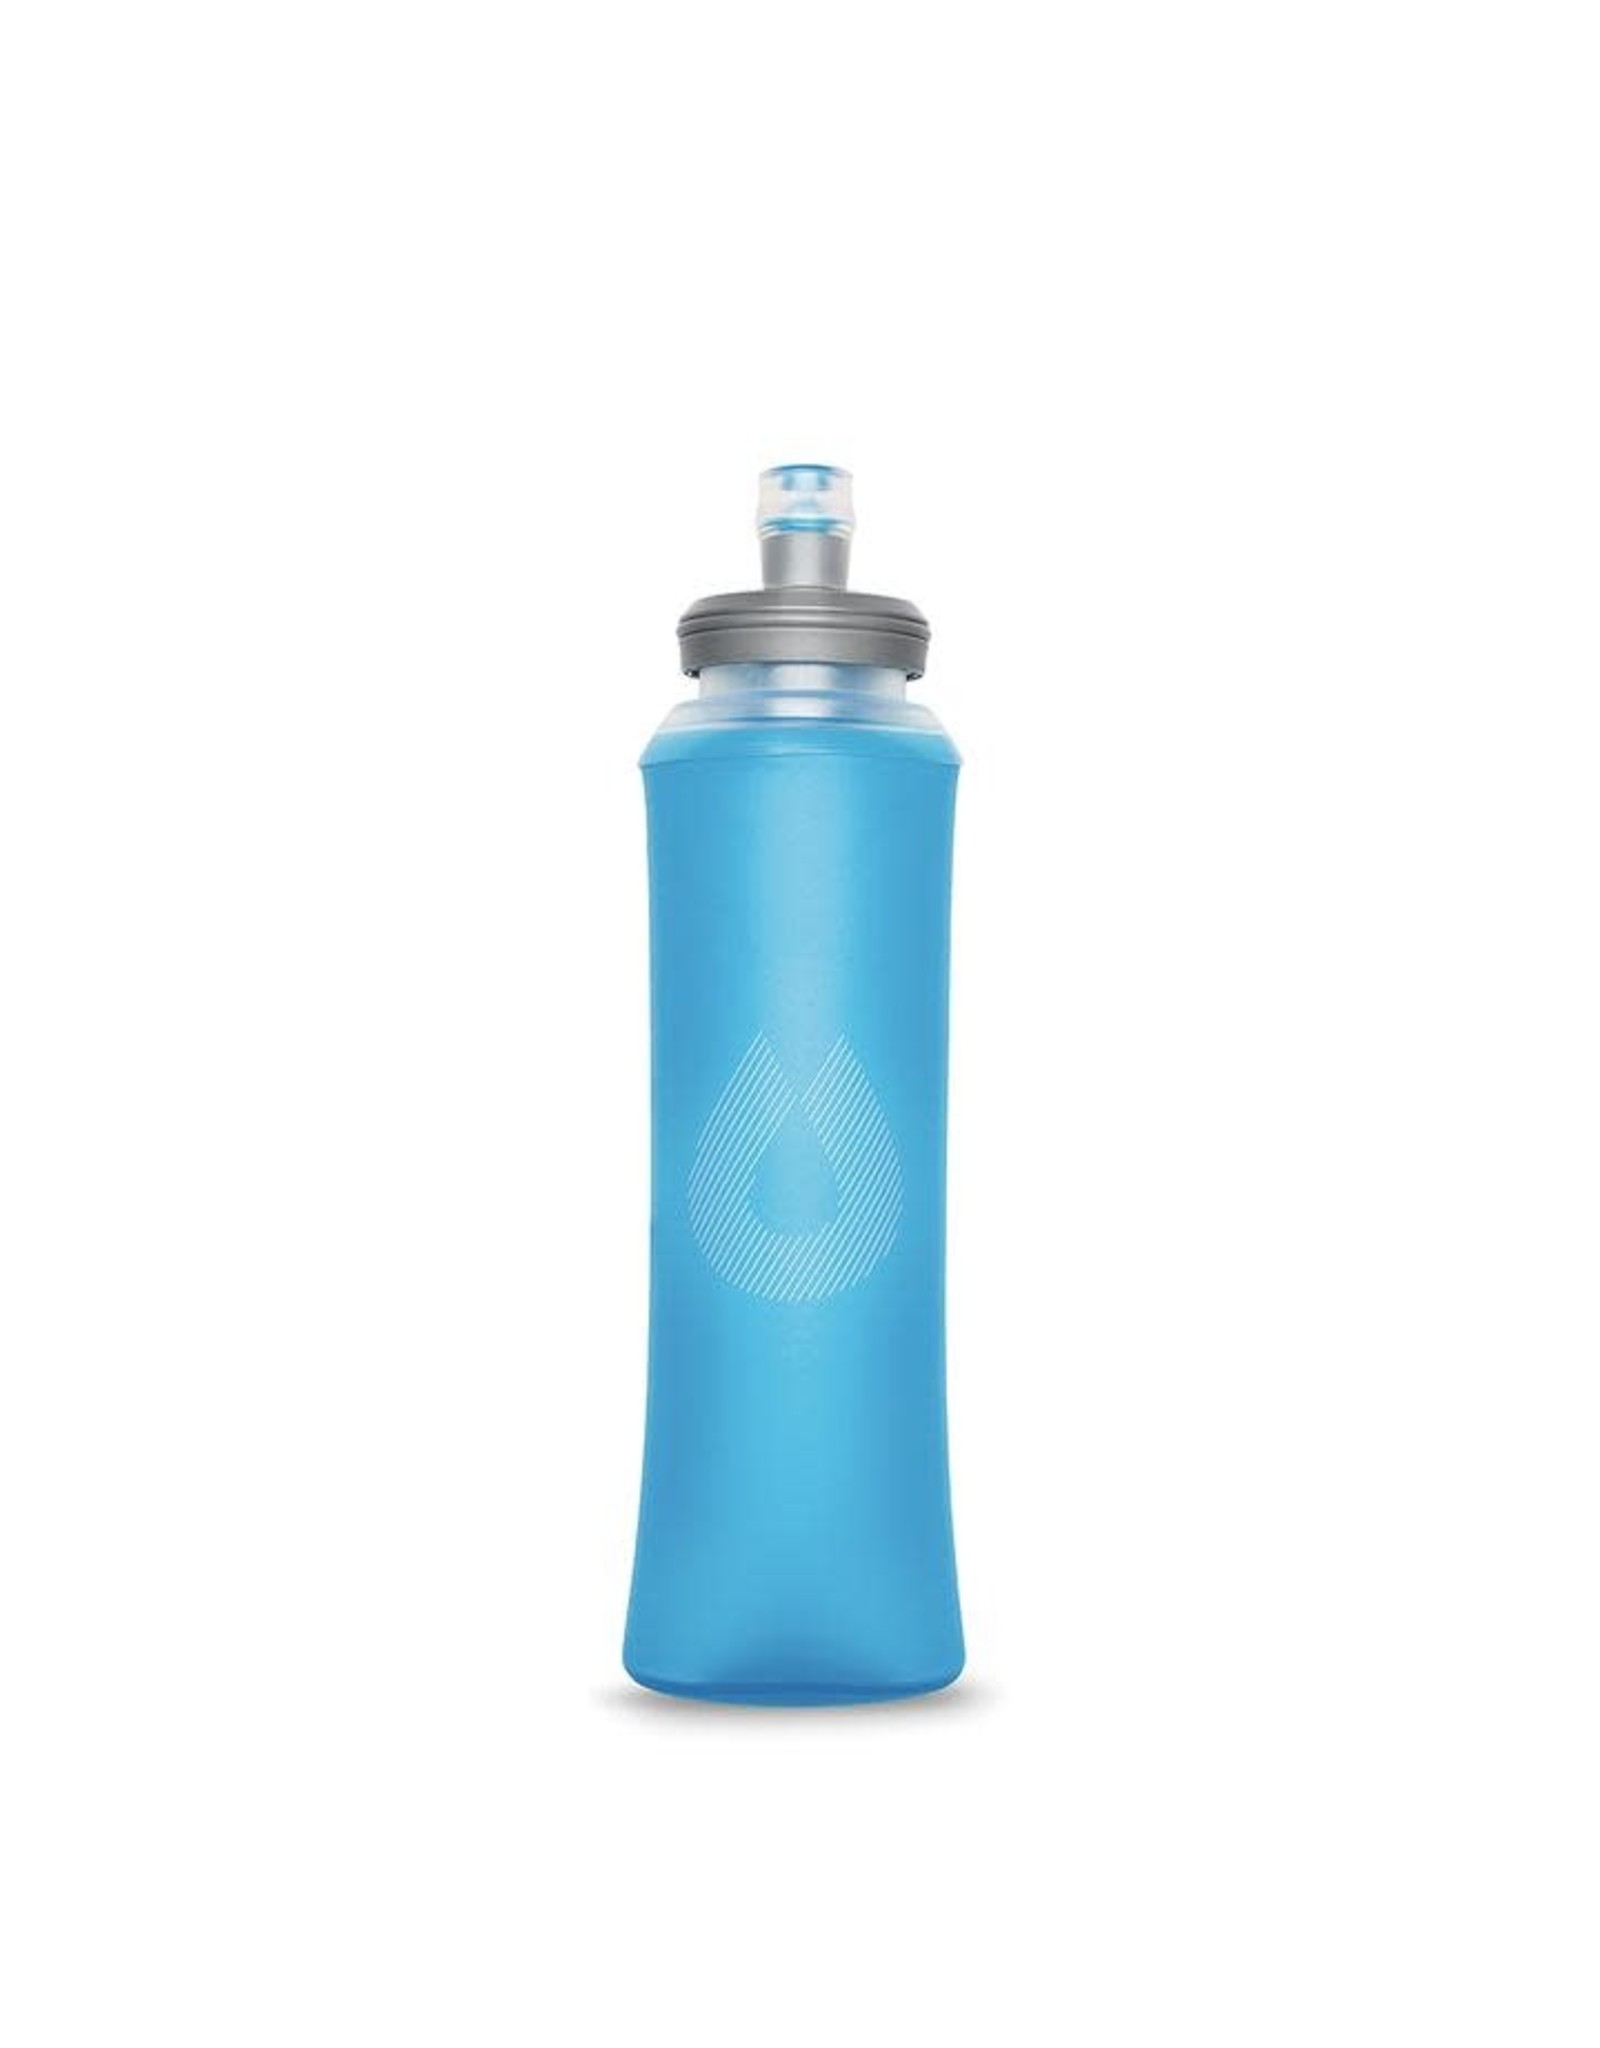 HydraPak HydraPak Ultraflask malibu blue 500ml water bottle